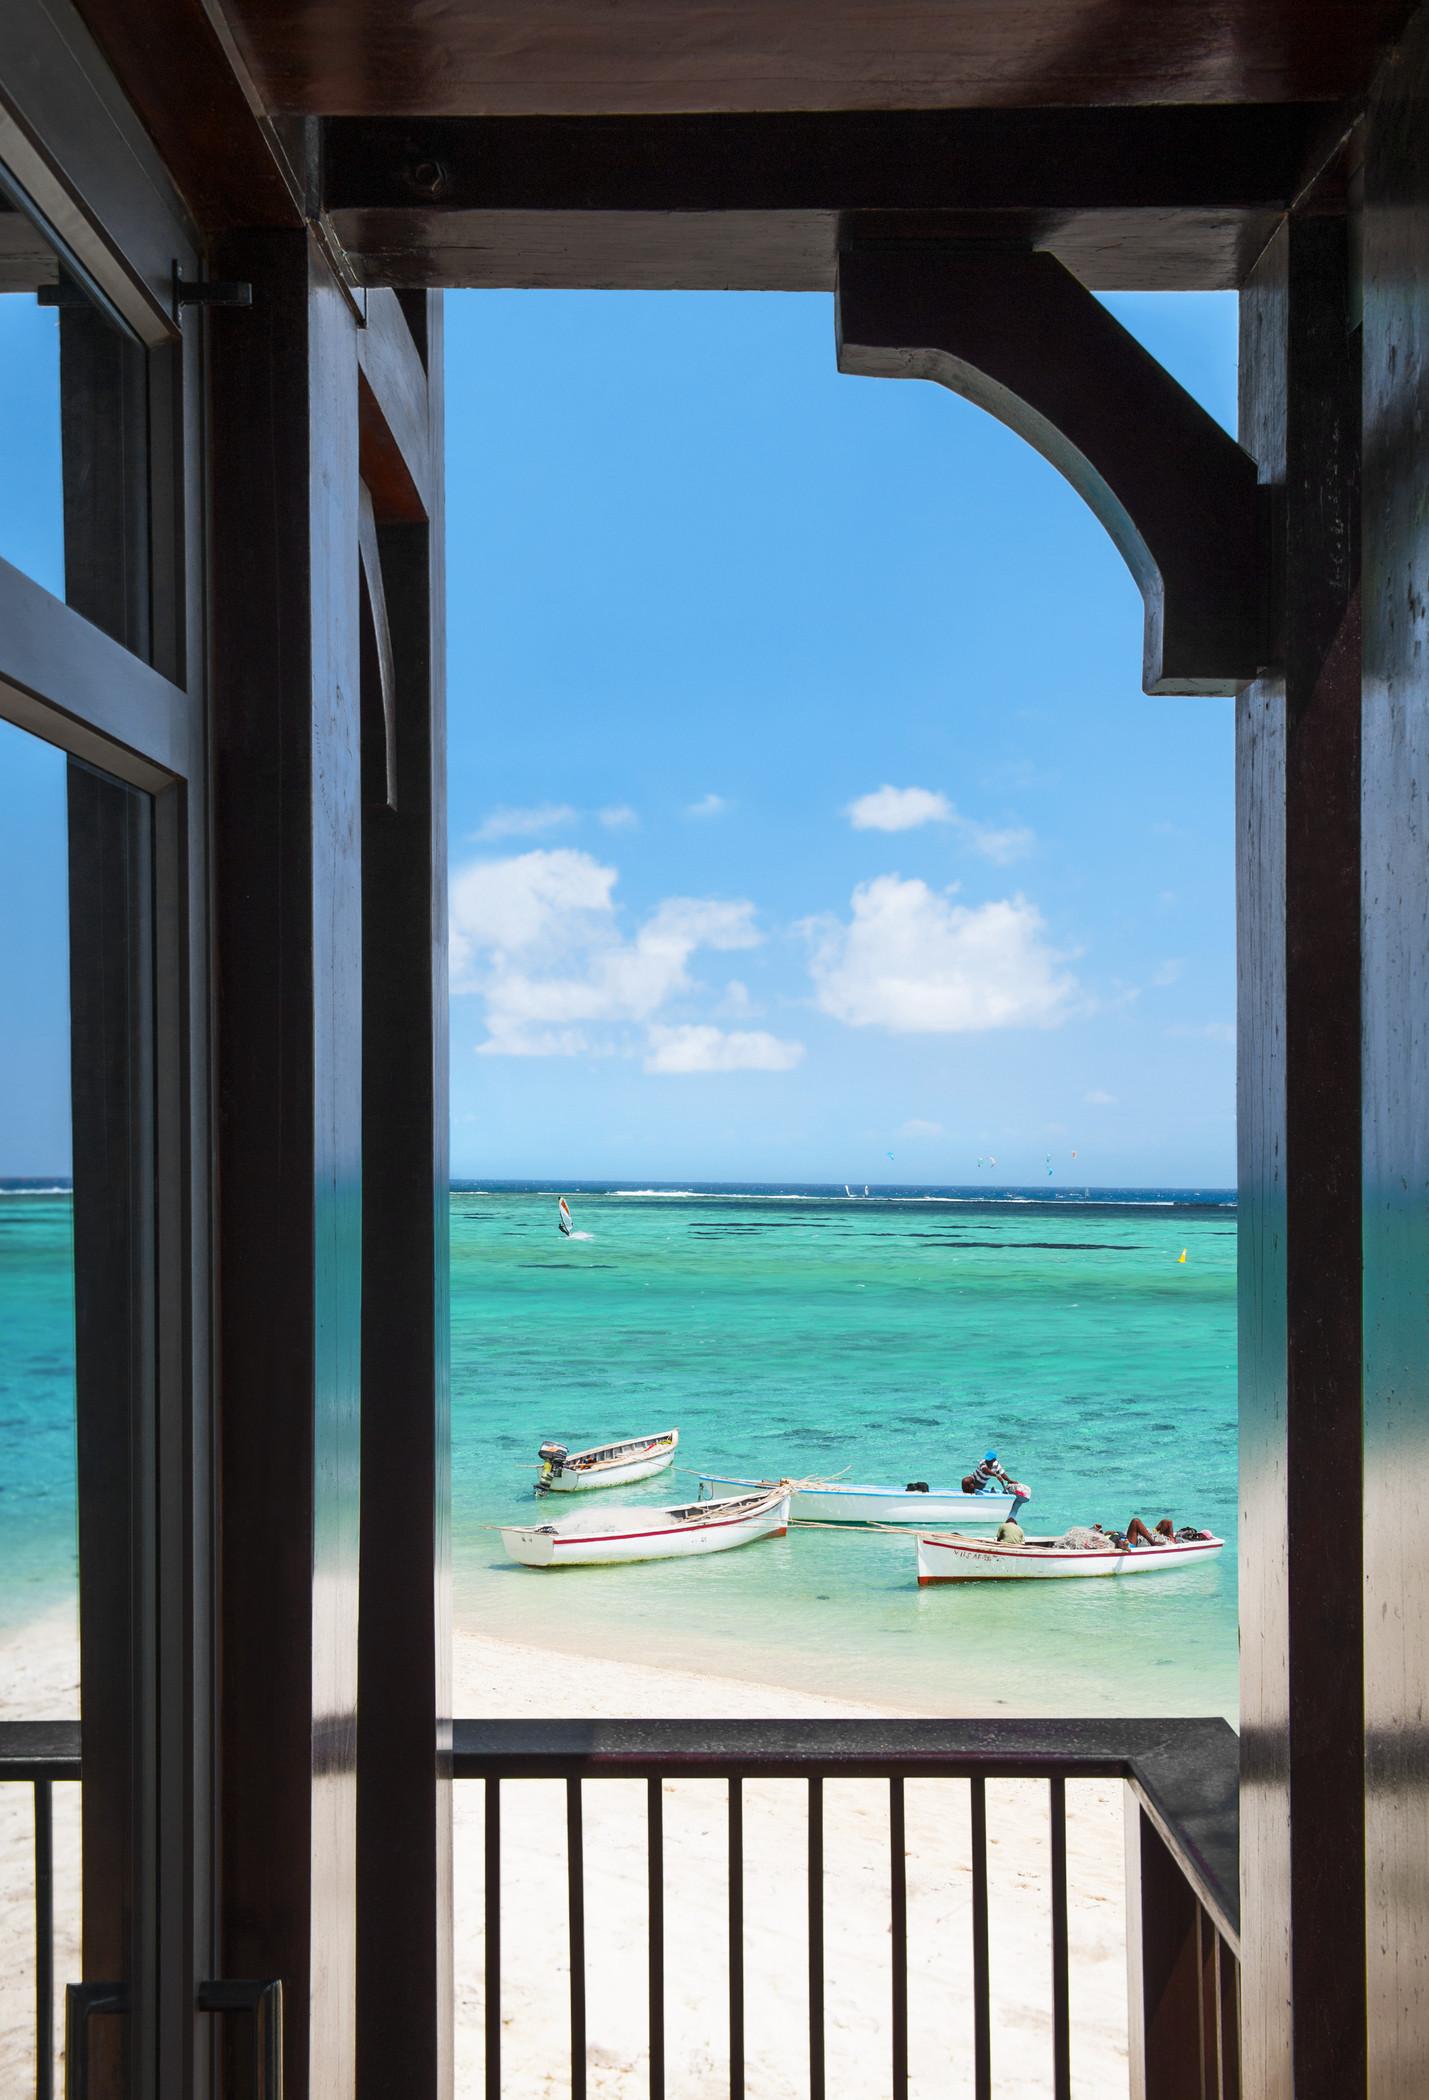 str3459gr-144523-The St Regis Villa Terrace with view on the Lagoon.jpg